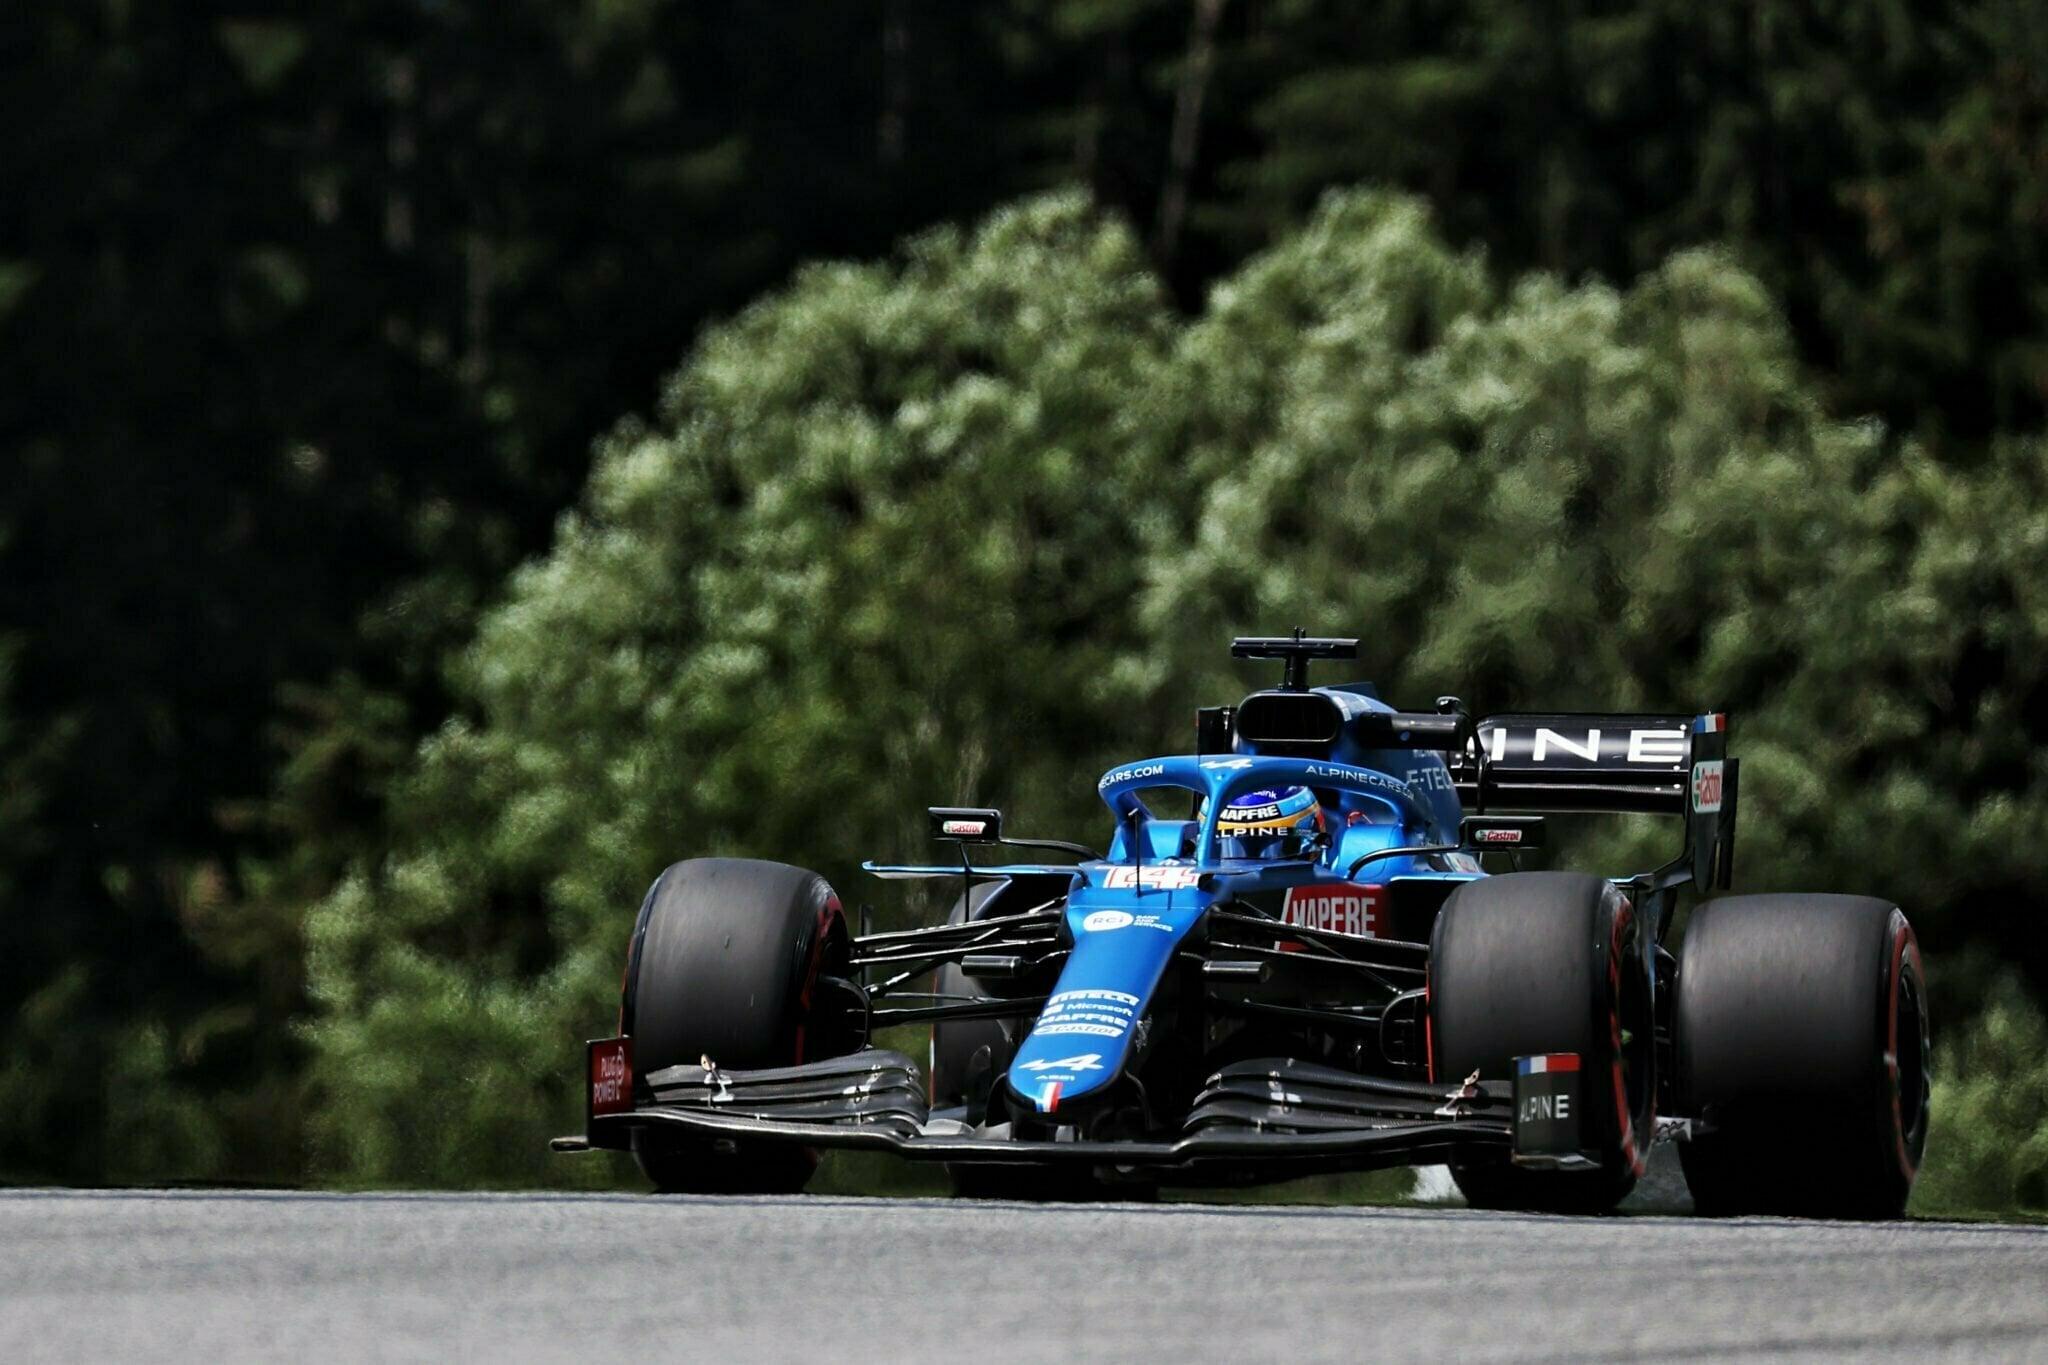 Alpine F1 Team Alonso Ocon Autriche Steiermark Grand Prix Spielberg A521 2021 30 | Alpine F1 : Alonso rapporte deux points au Grand Prix BWT de Styrie